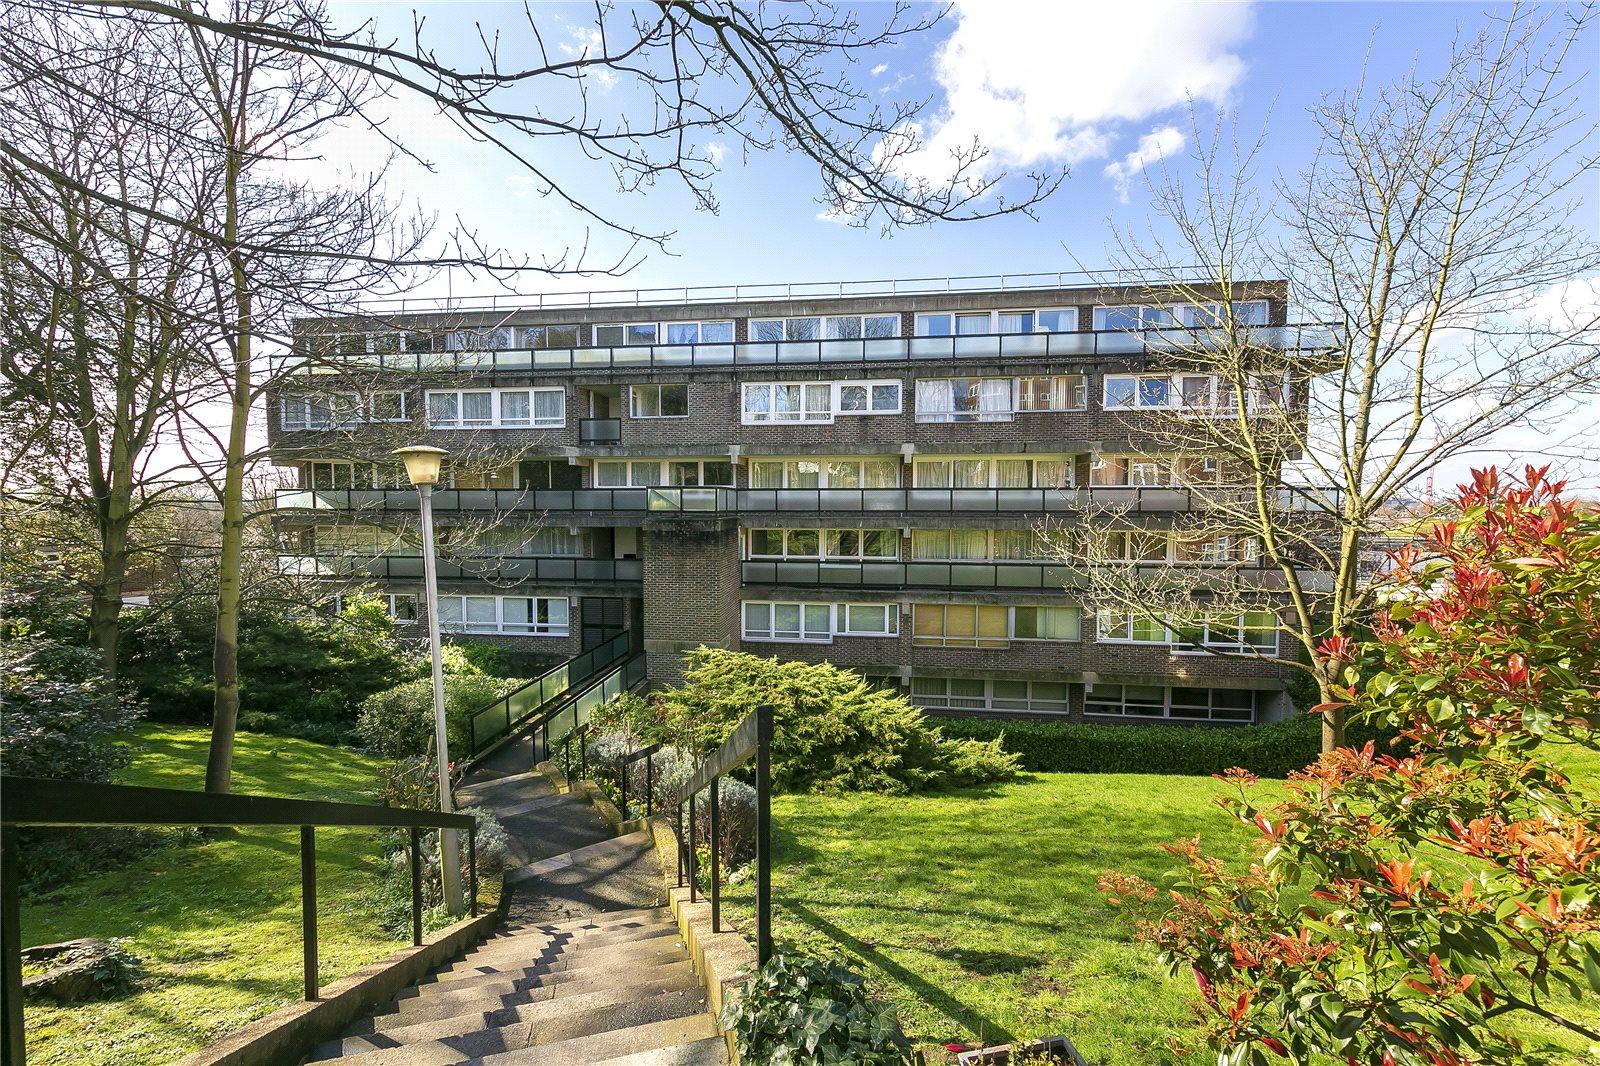 Bromwich House, Richmond, TW10 6RU - Antony Roberts